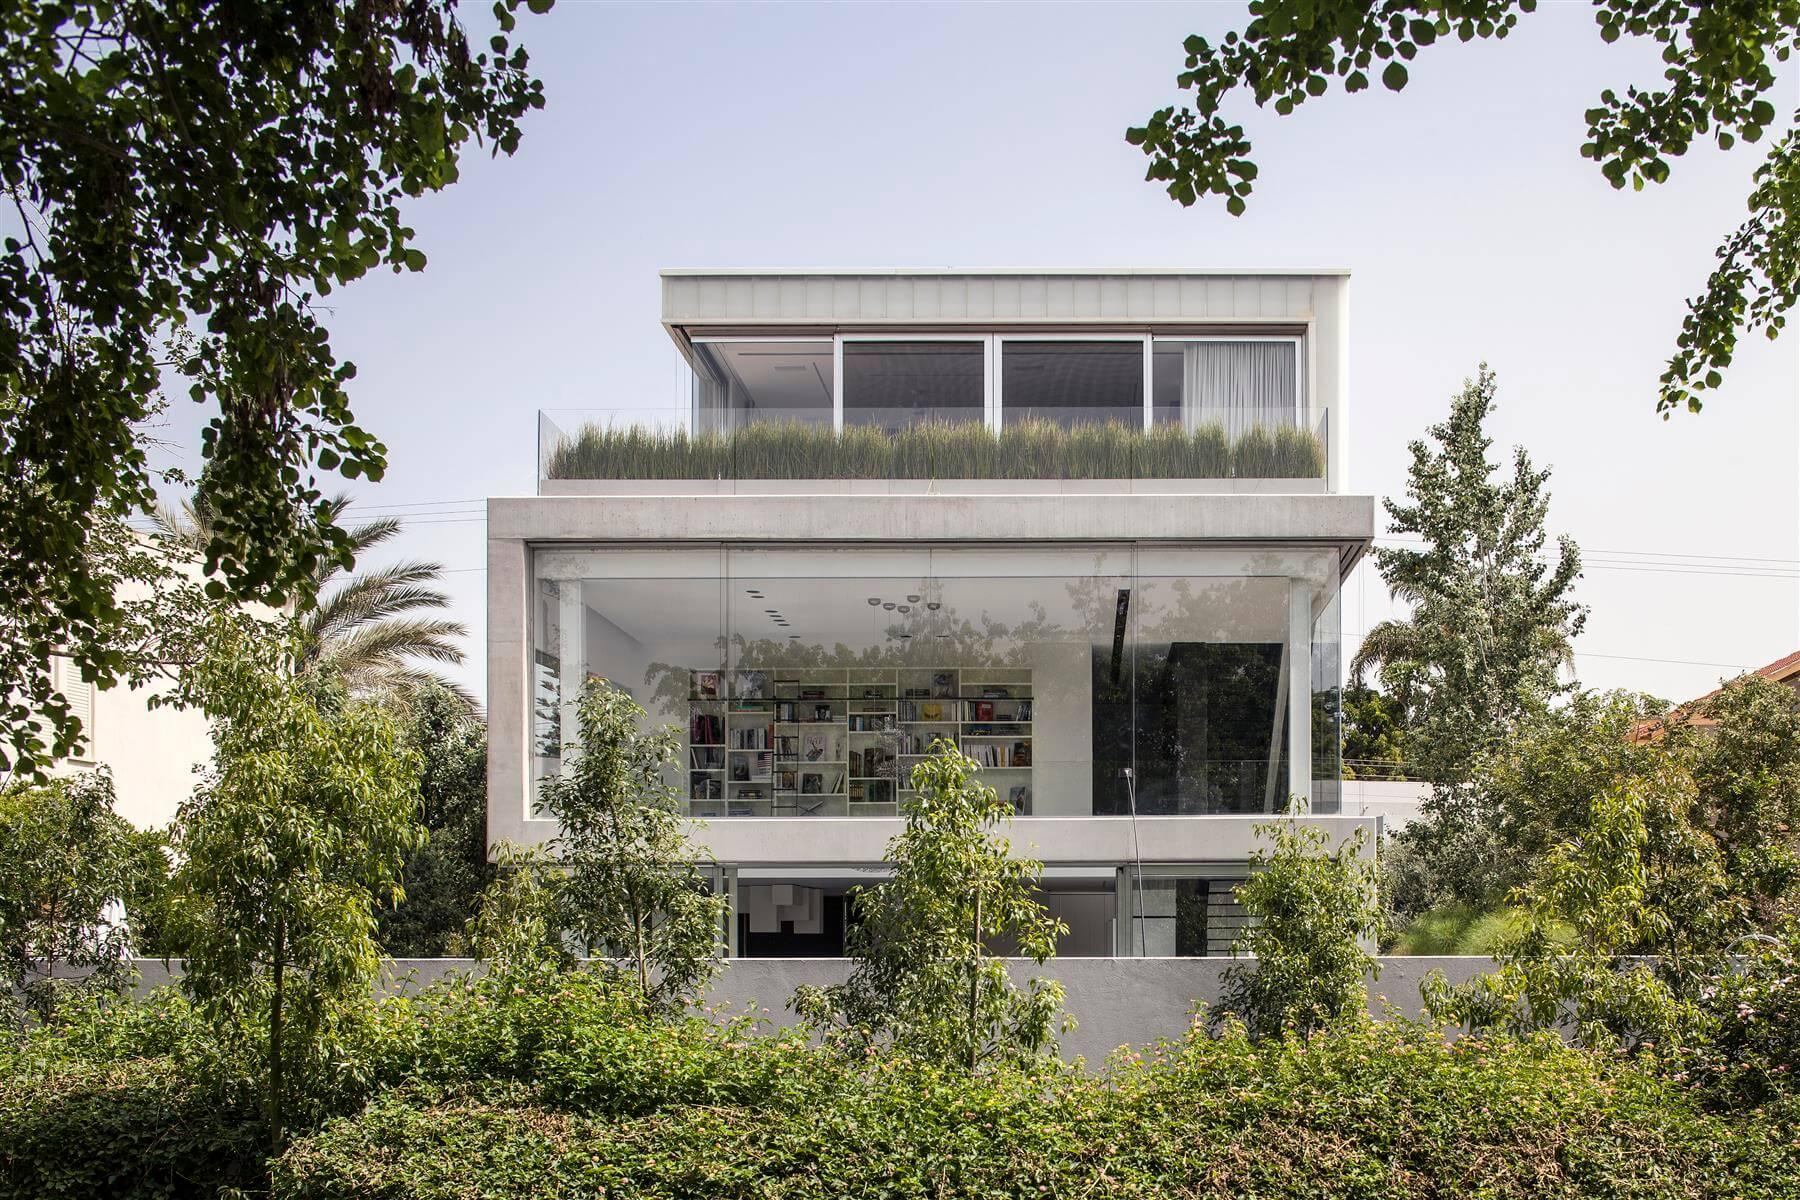 The Concrete Cut House in Ramat Gan by Pitsou Kedem Architects-08